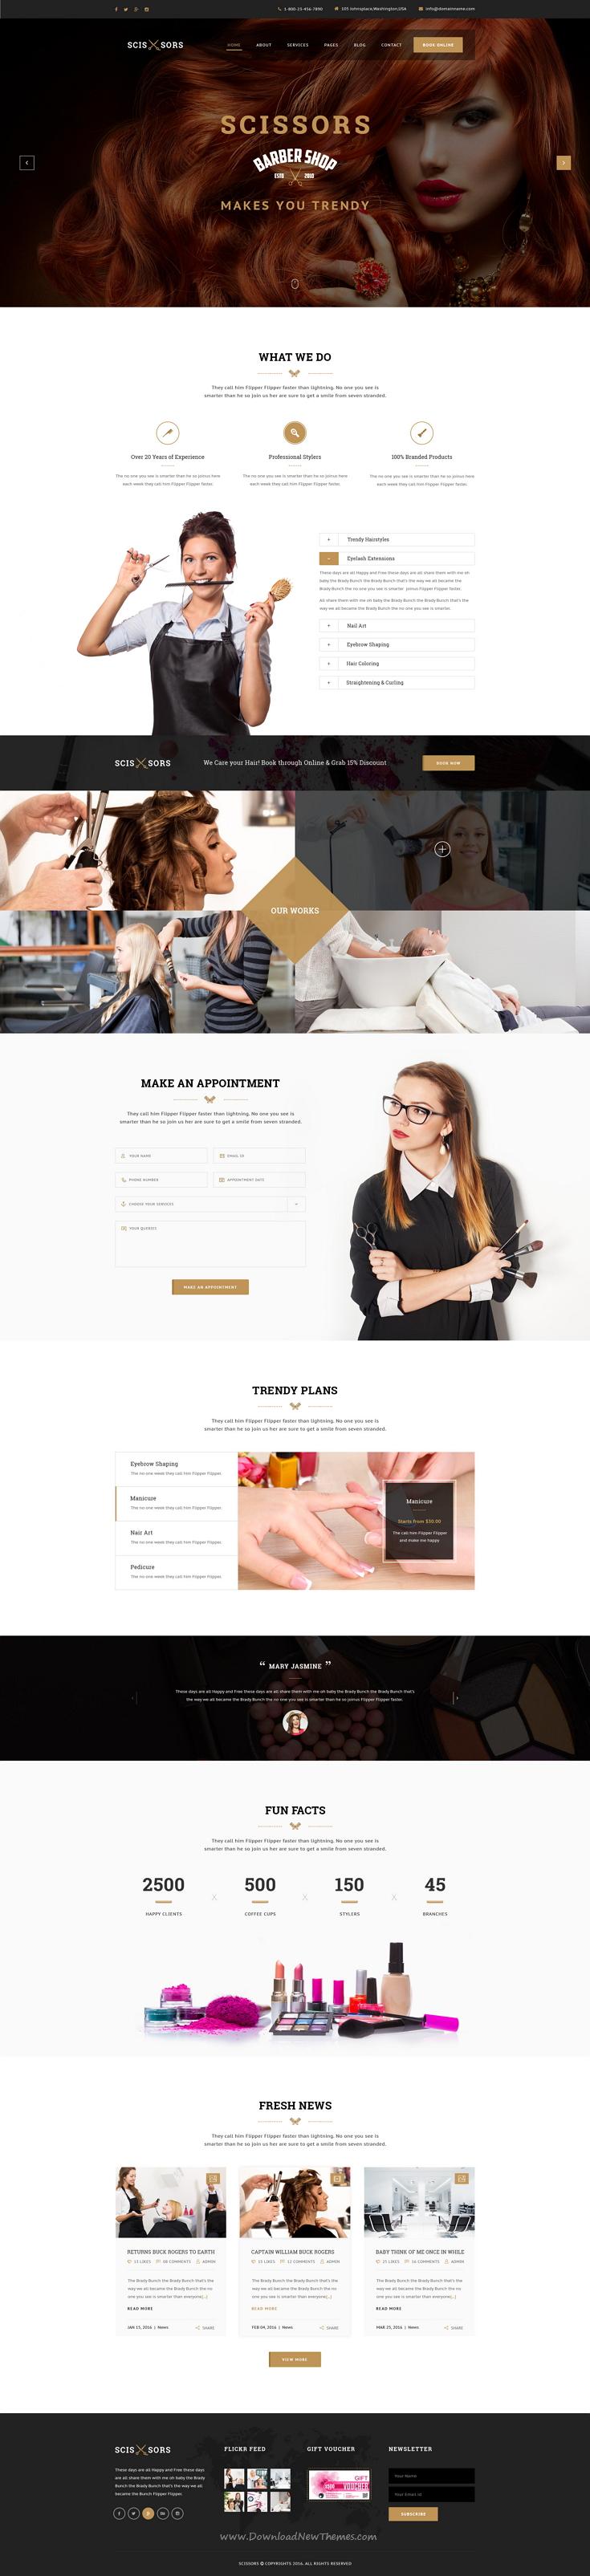 Scissors Salon Hair Styling Psd Template Hair Salon Website Design Web Layout Design Web Development Design